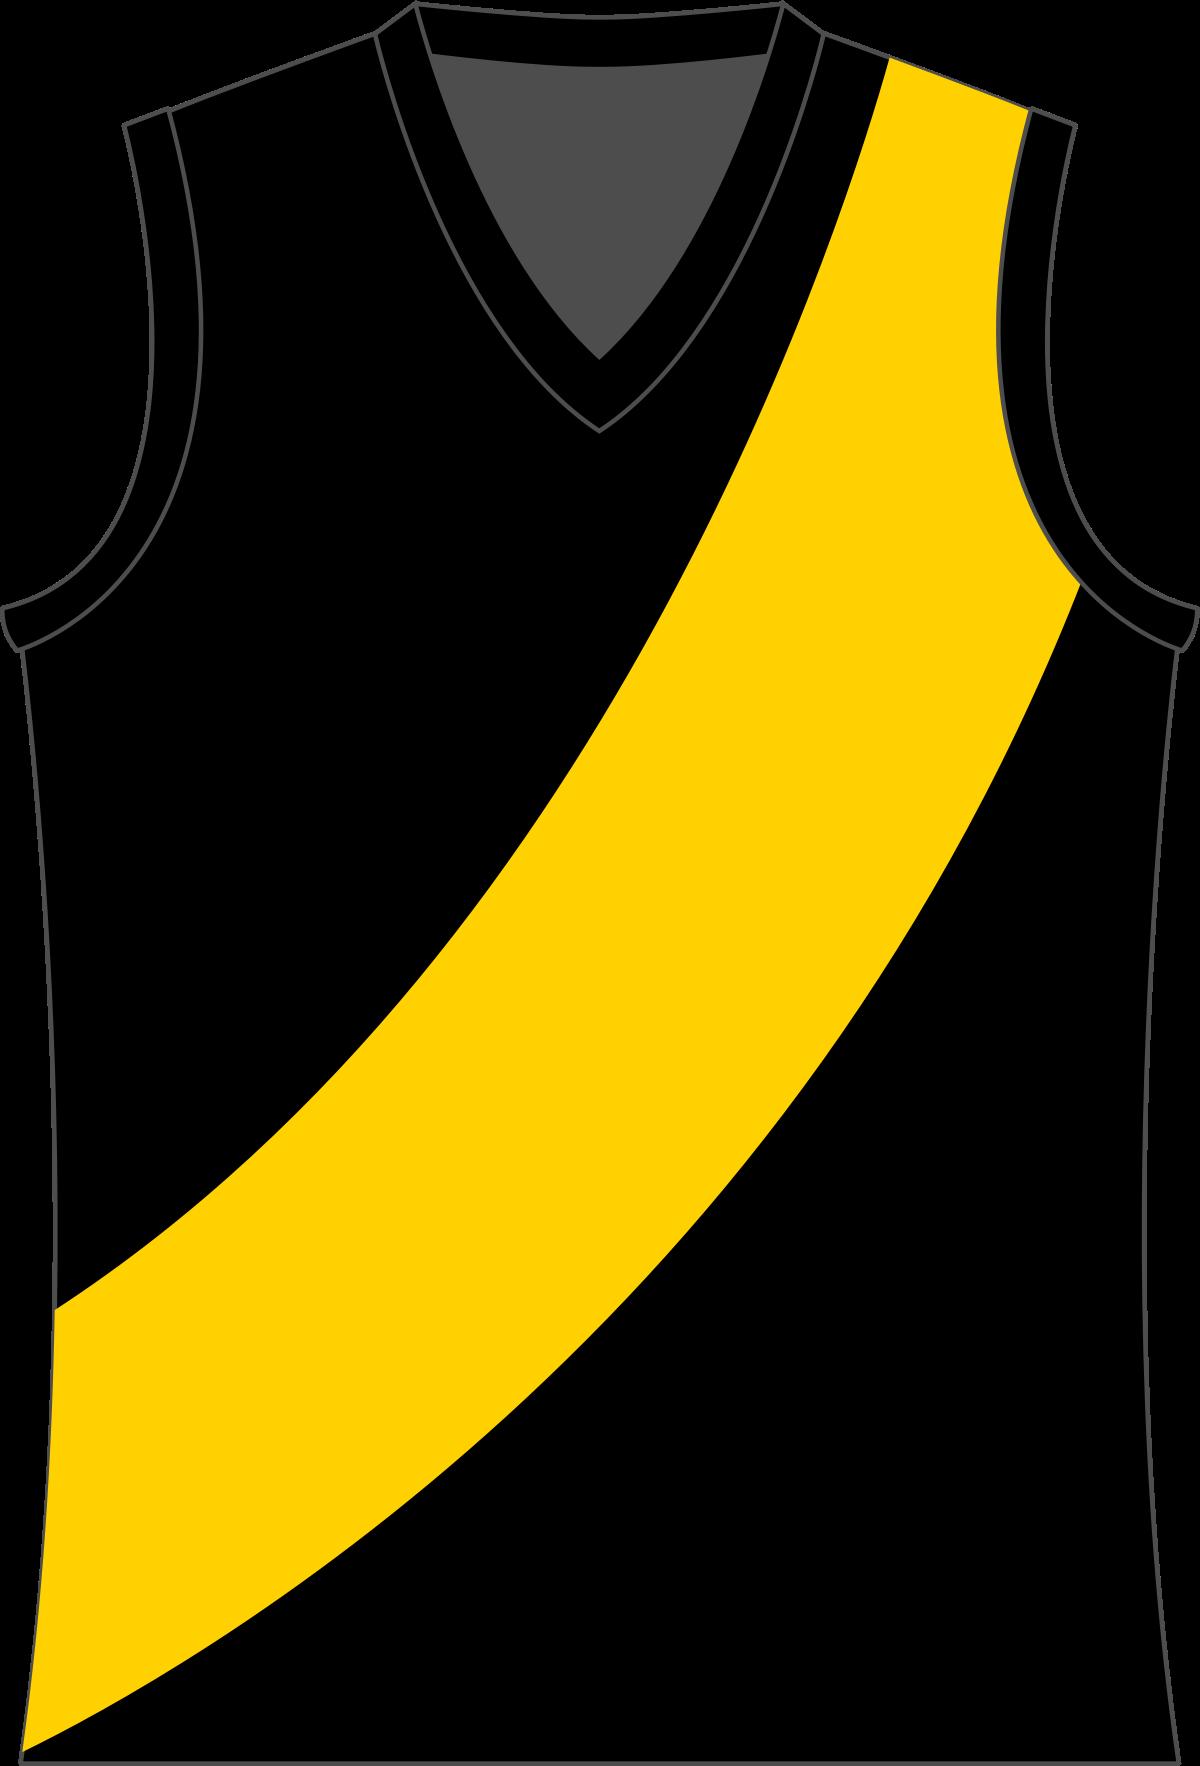 Simpson Football Netball Club.